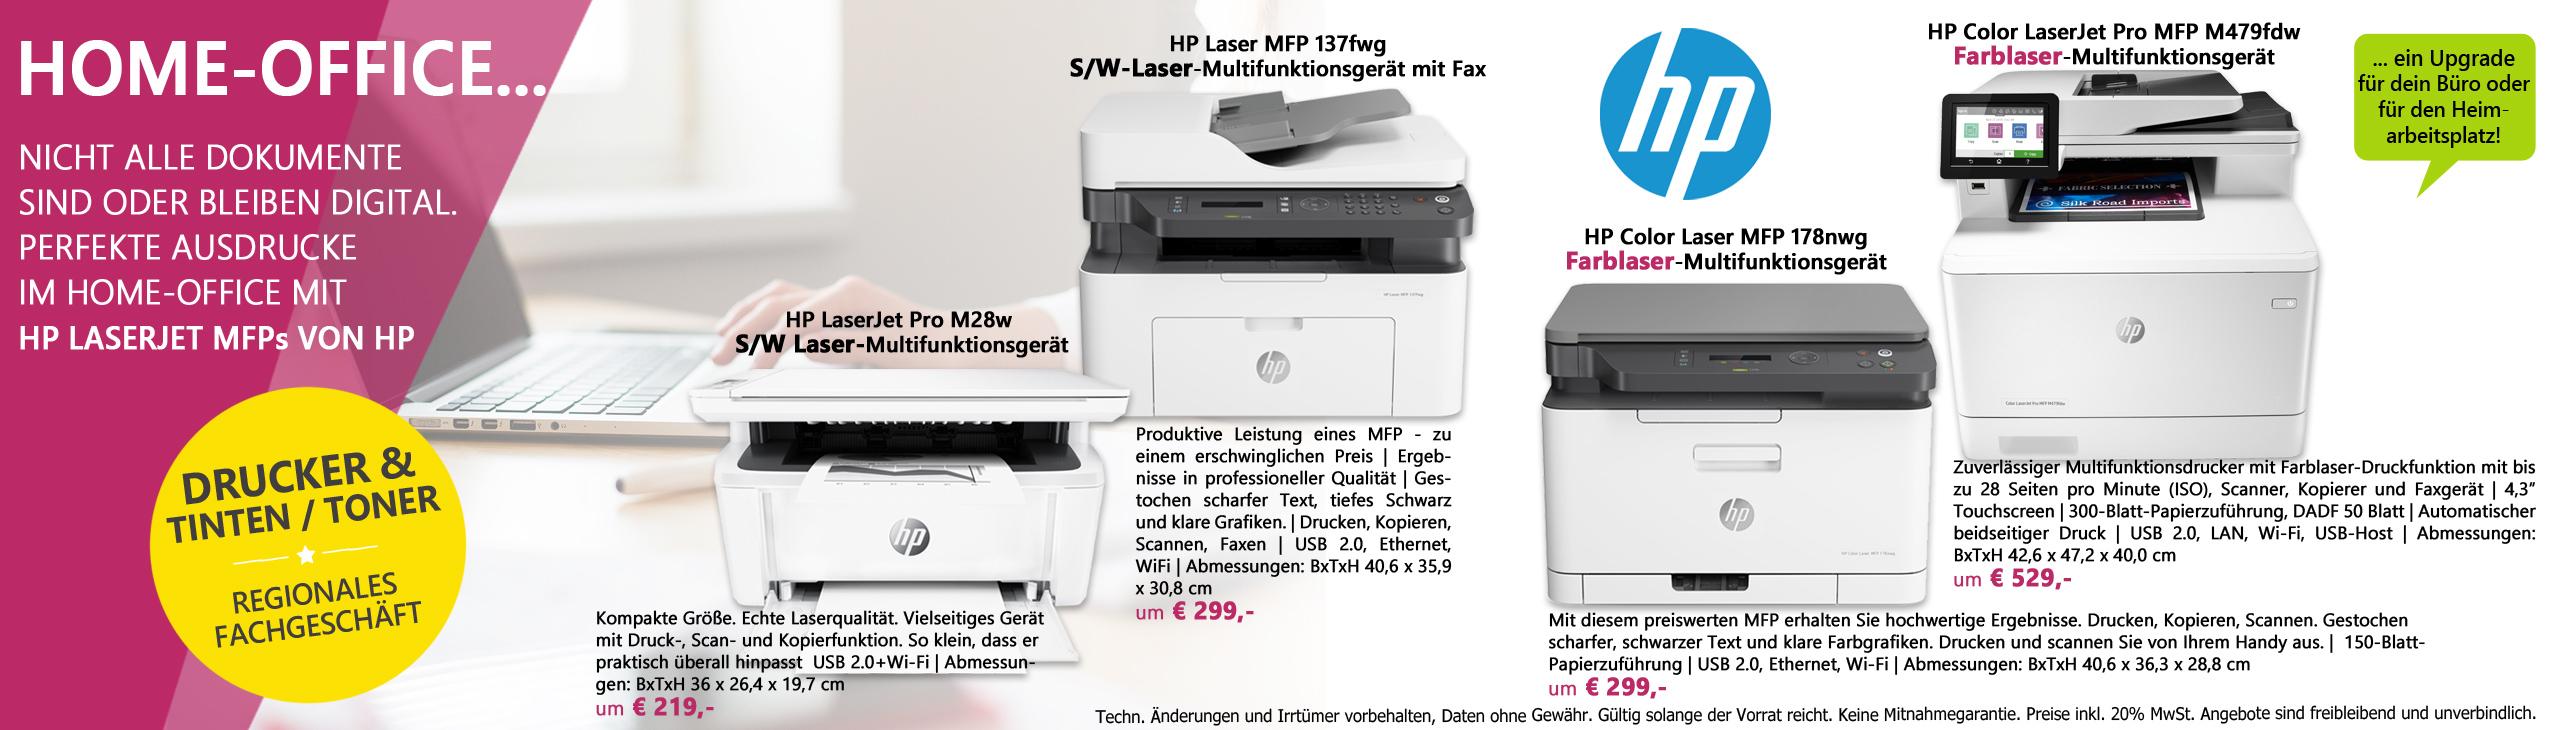 Banner homeoffice hp laserdrucker